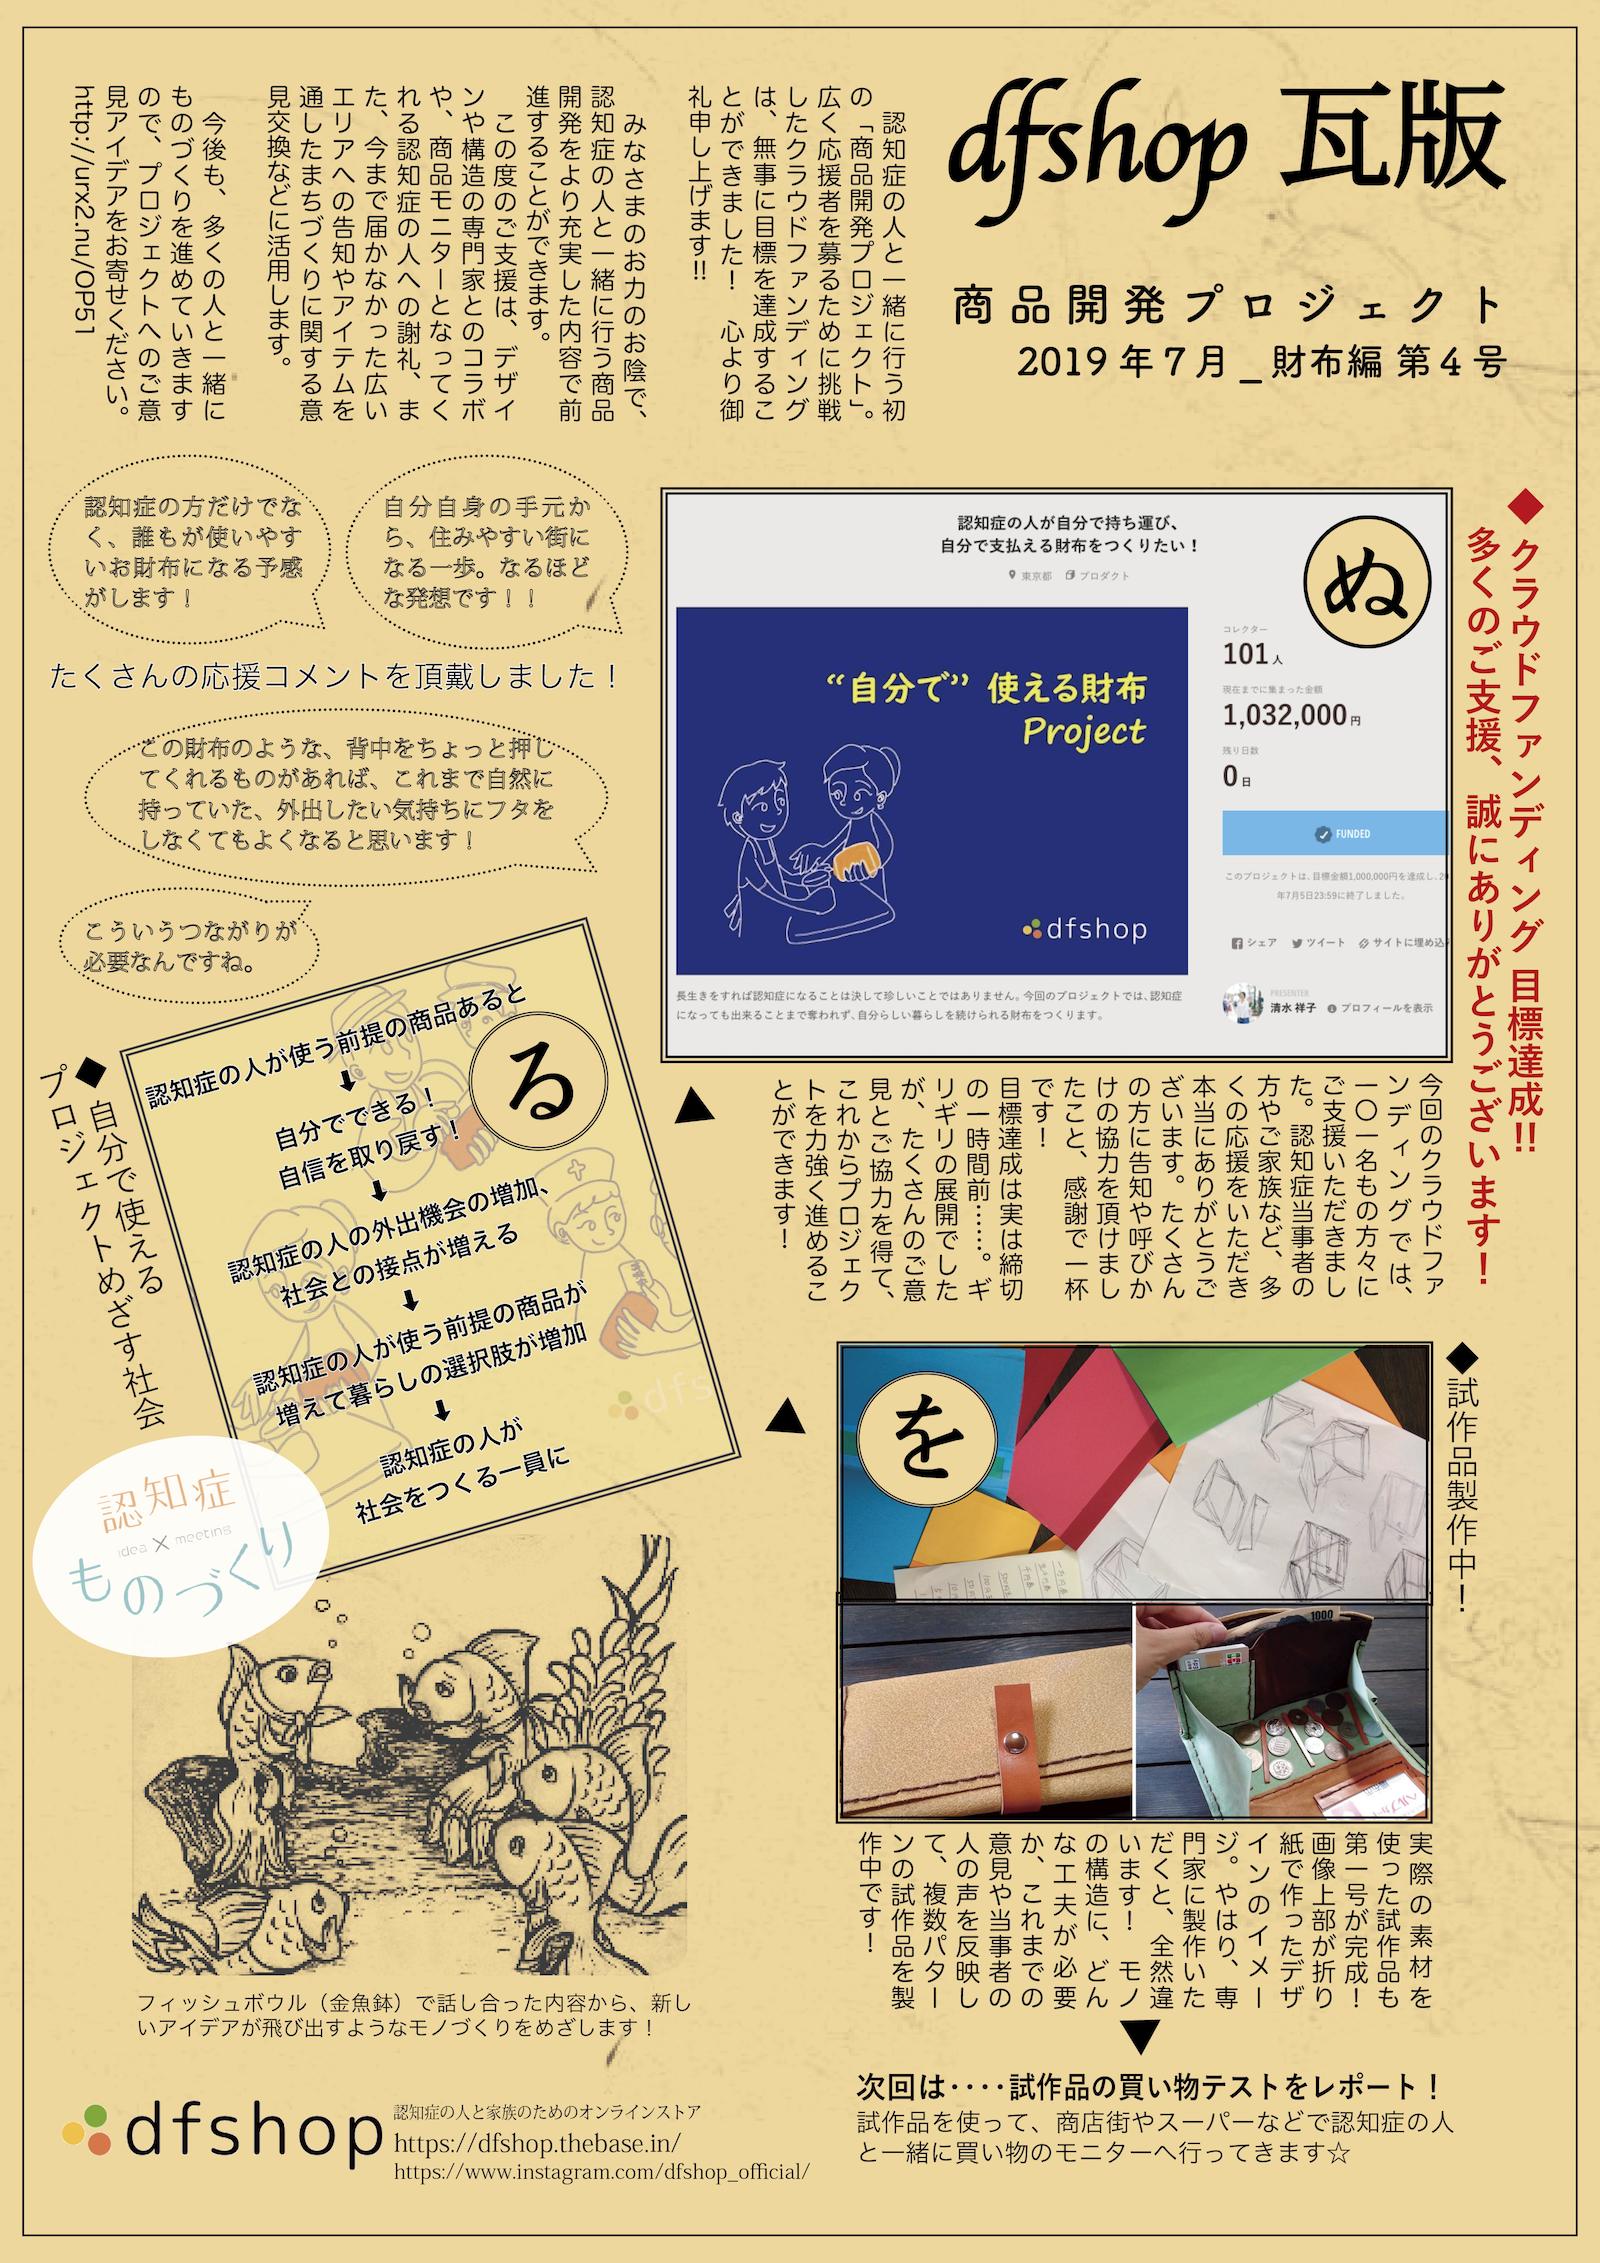 dfshop 瓦版 04号 - クラウドファンディング 達成御礼!!-